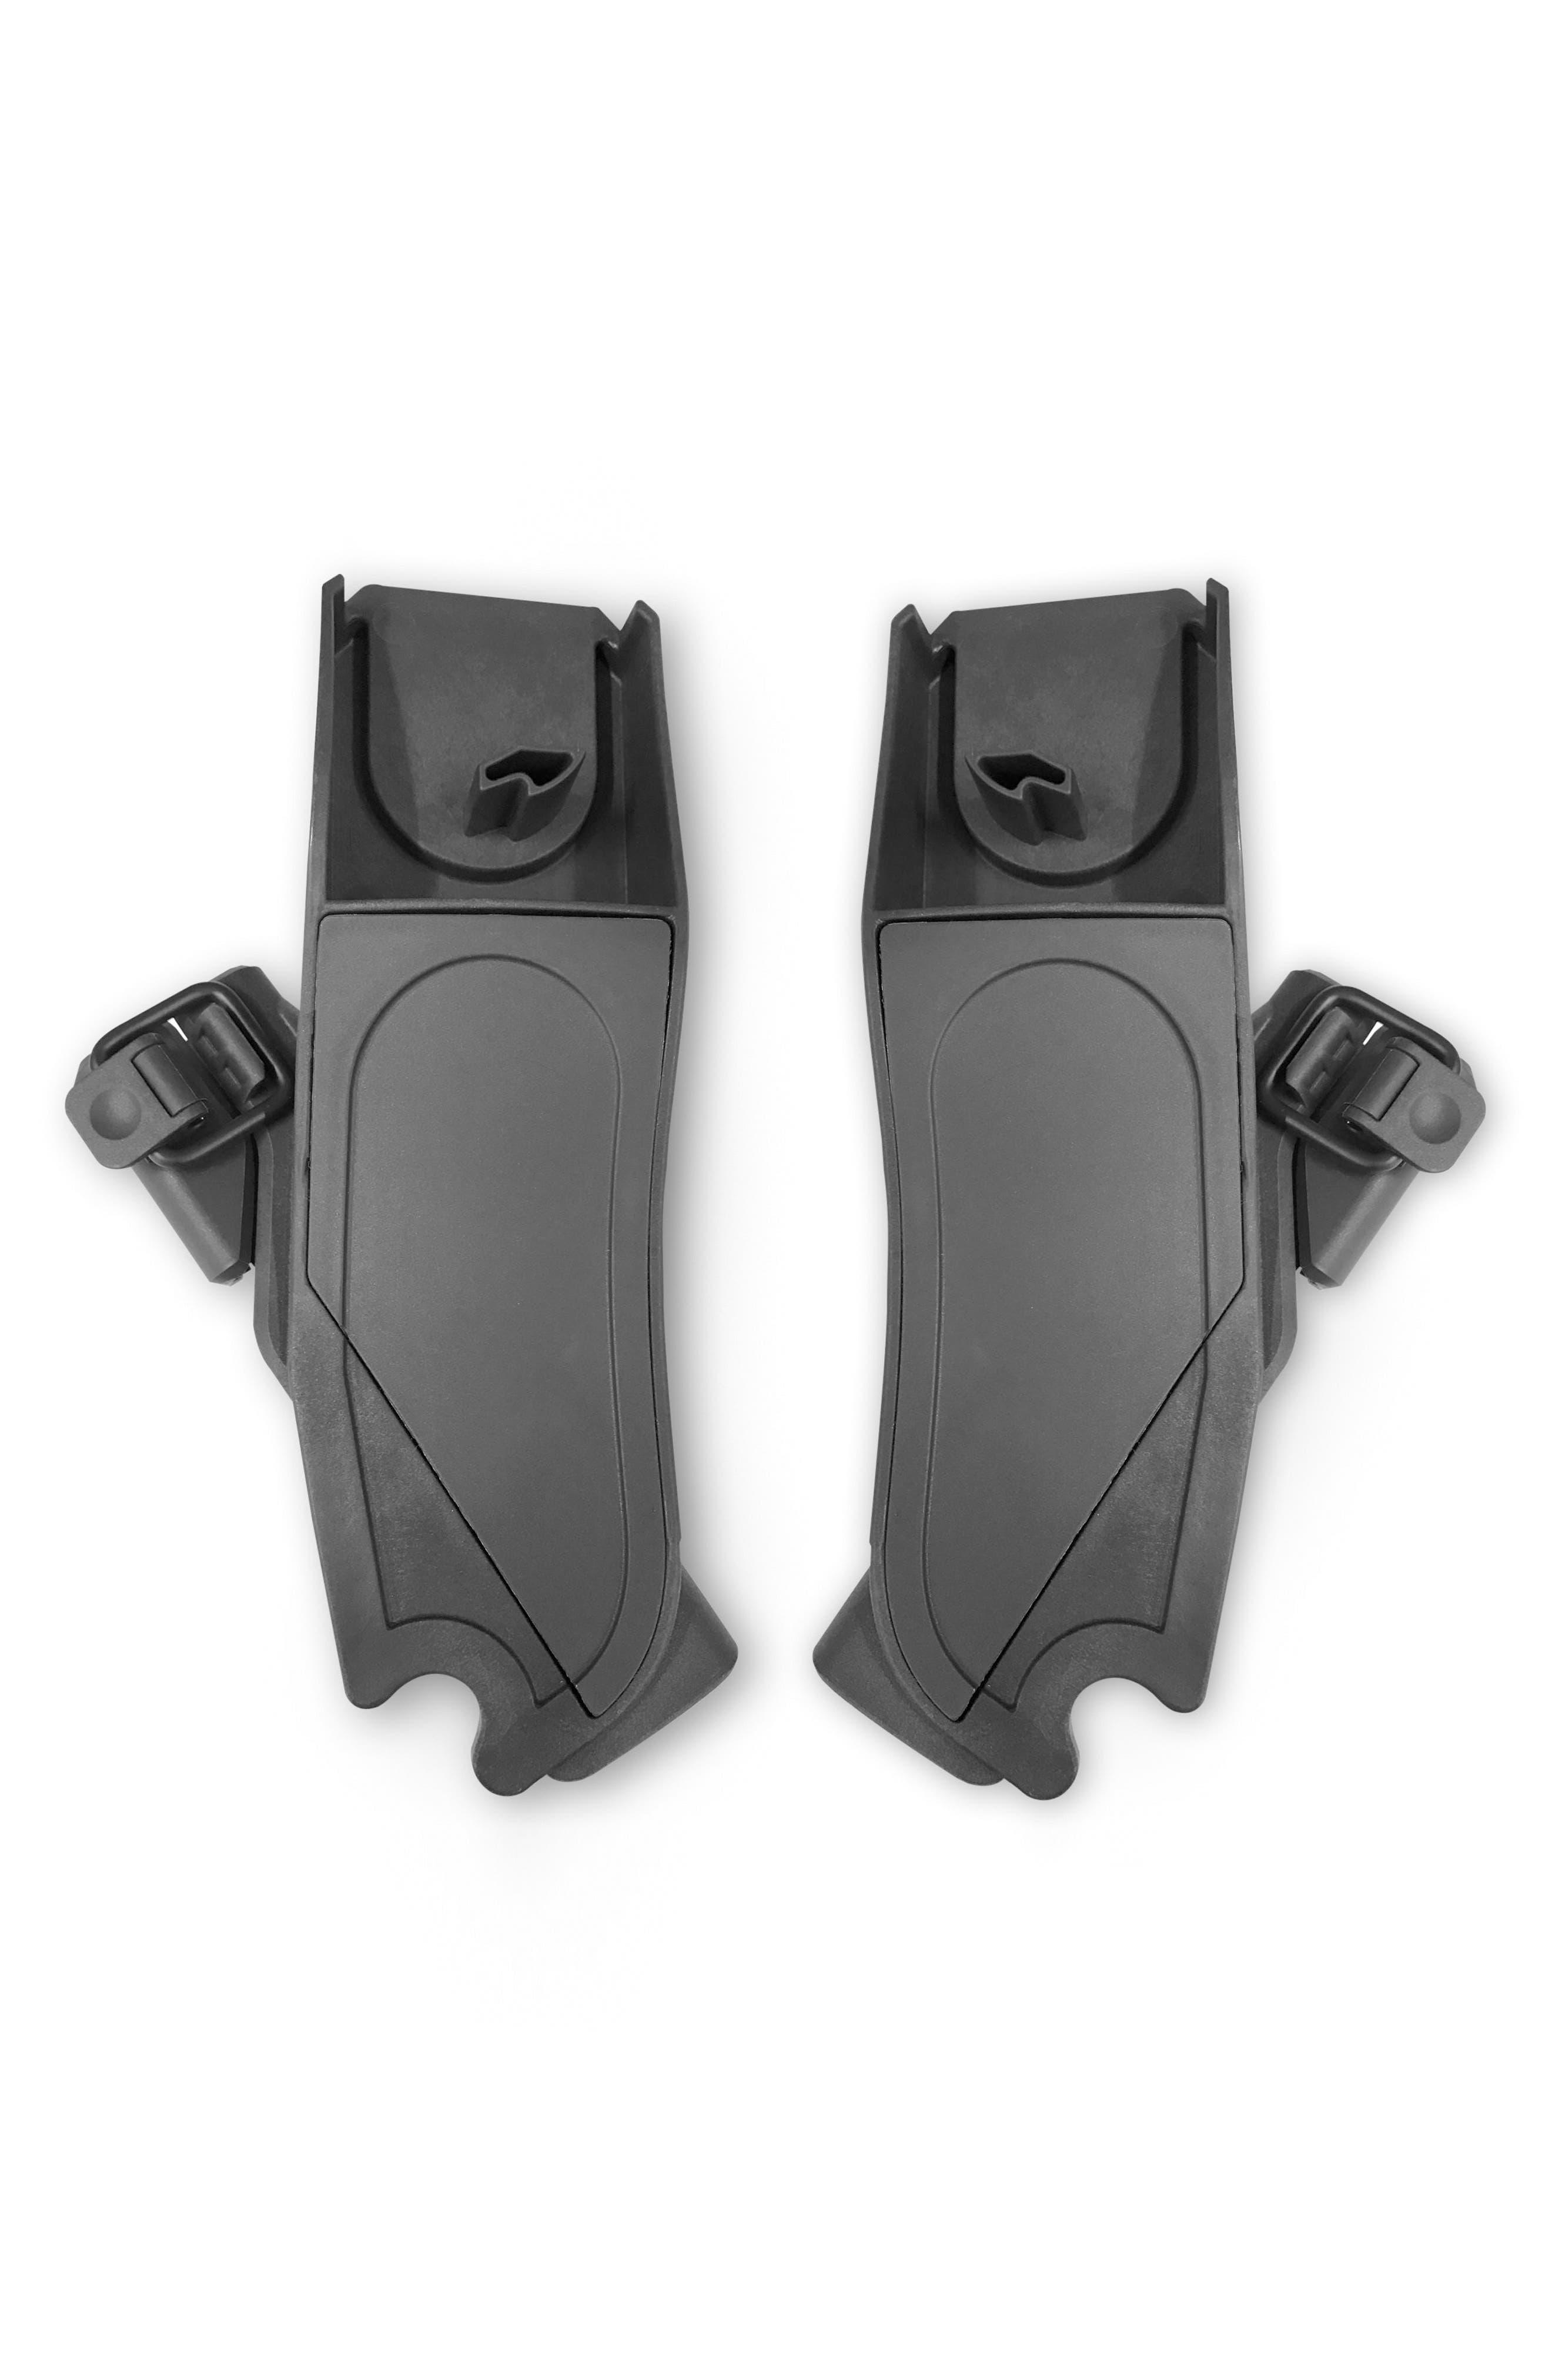 UPPAbaby Lower Maxi-Cosi®/Nuna Car Seat Adapter